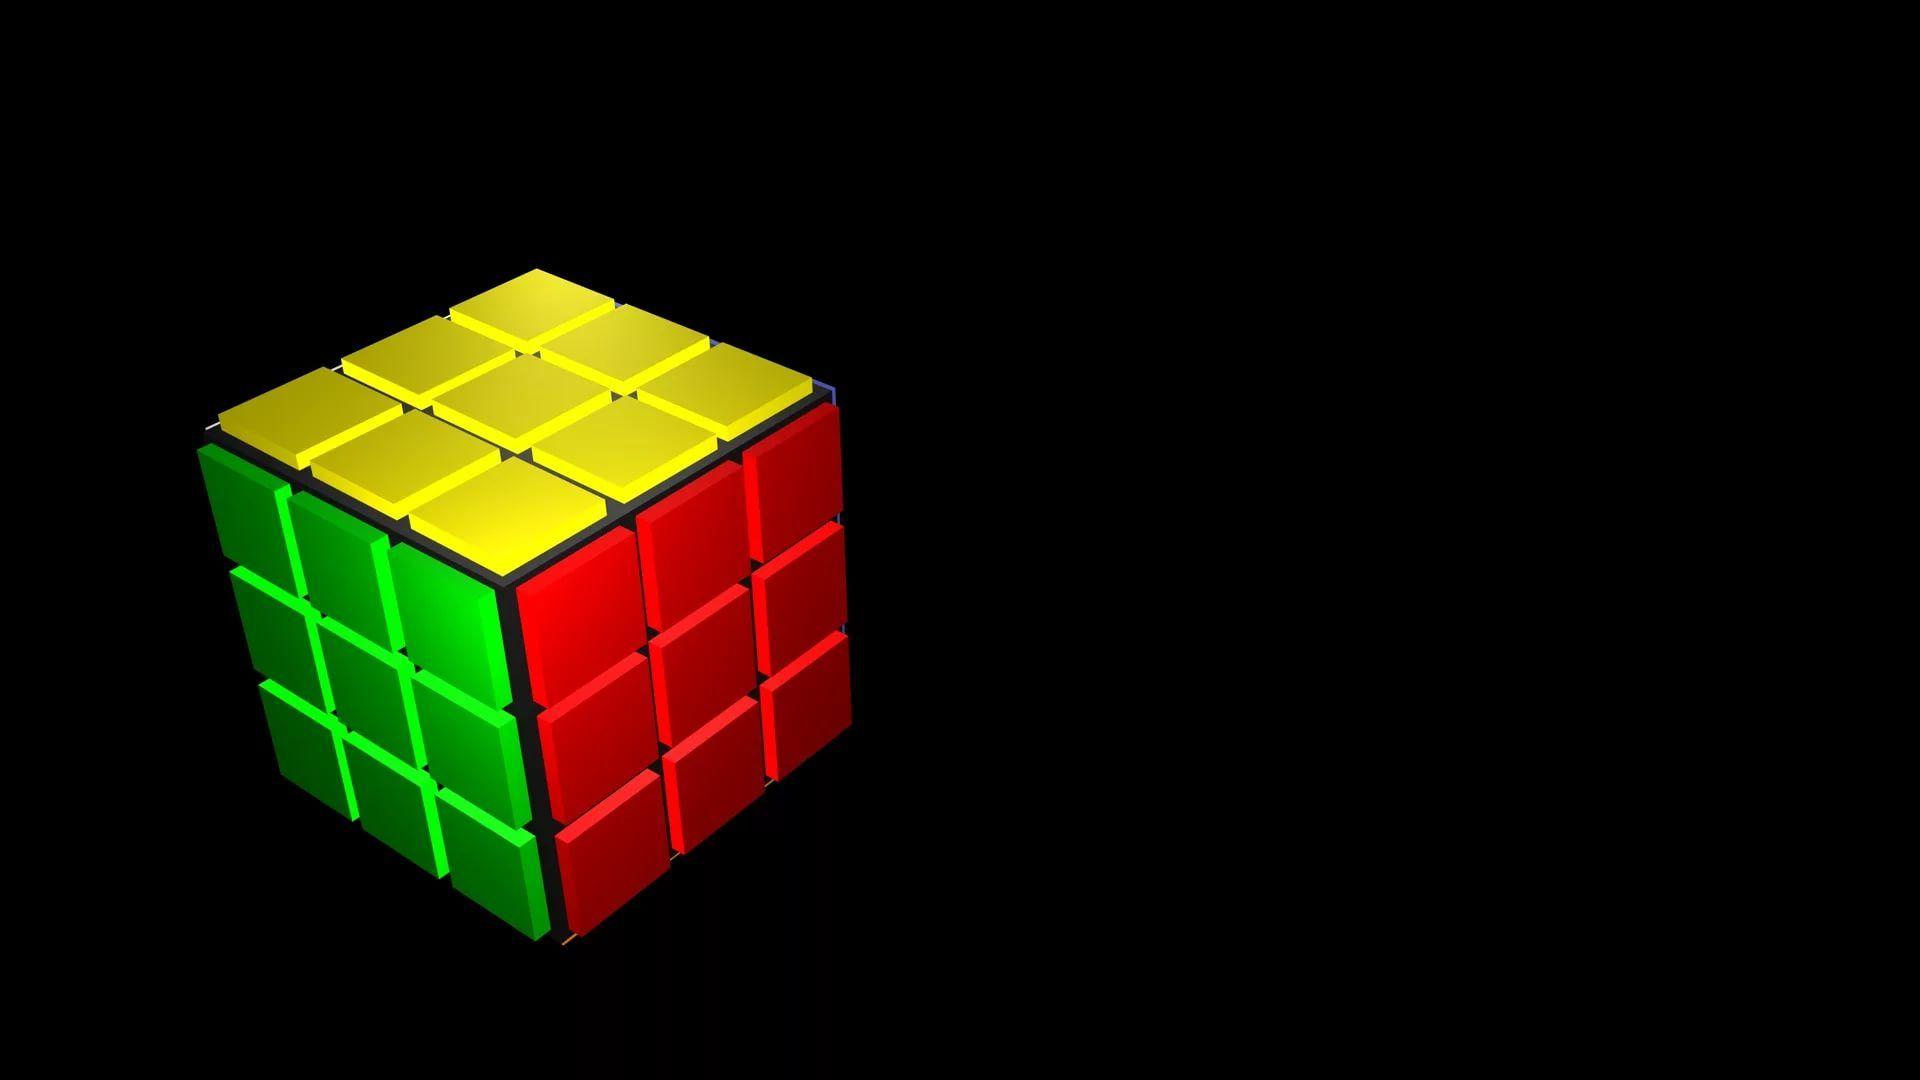 Rubiks Cube Nice Wallpaper